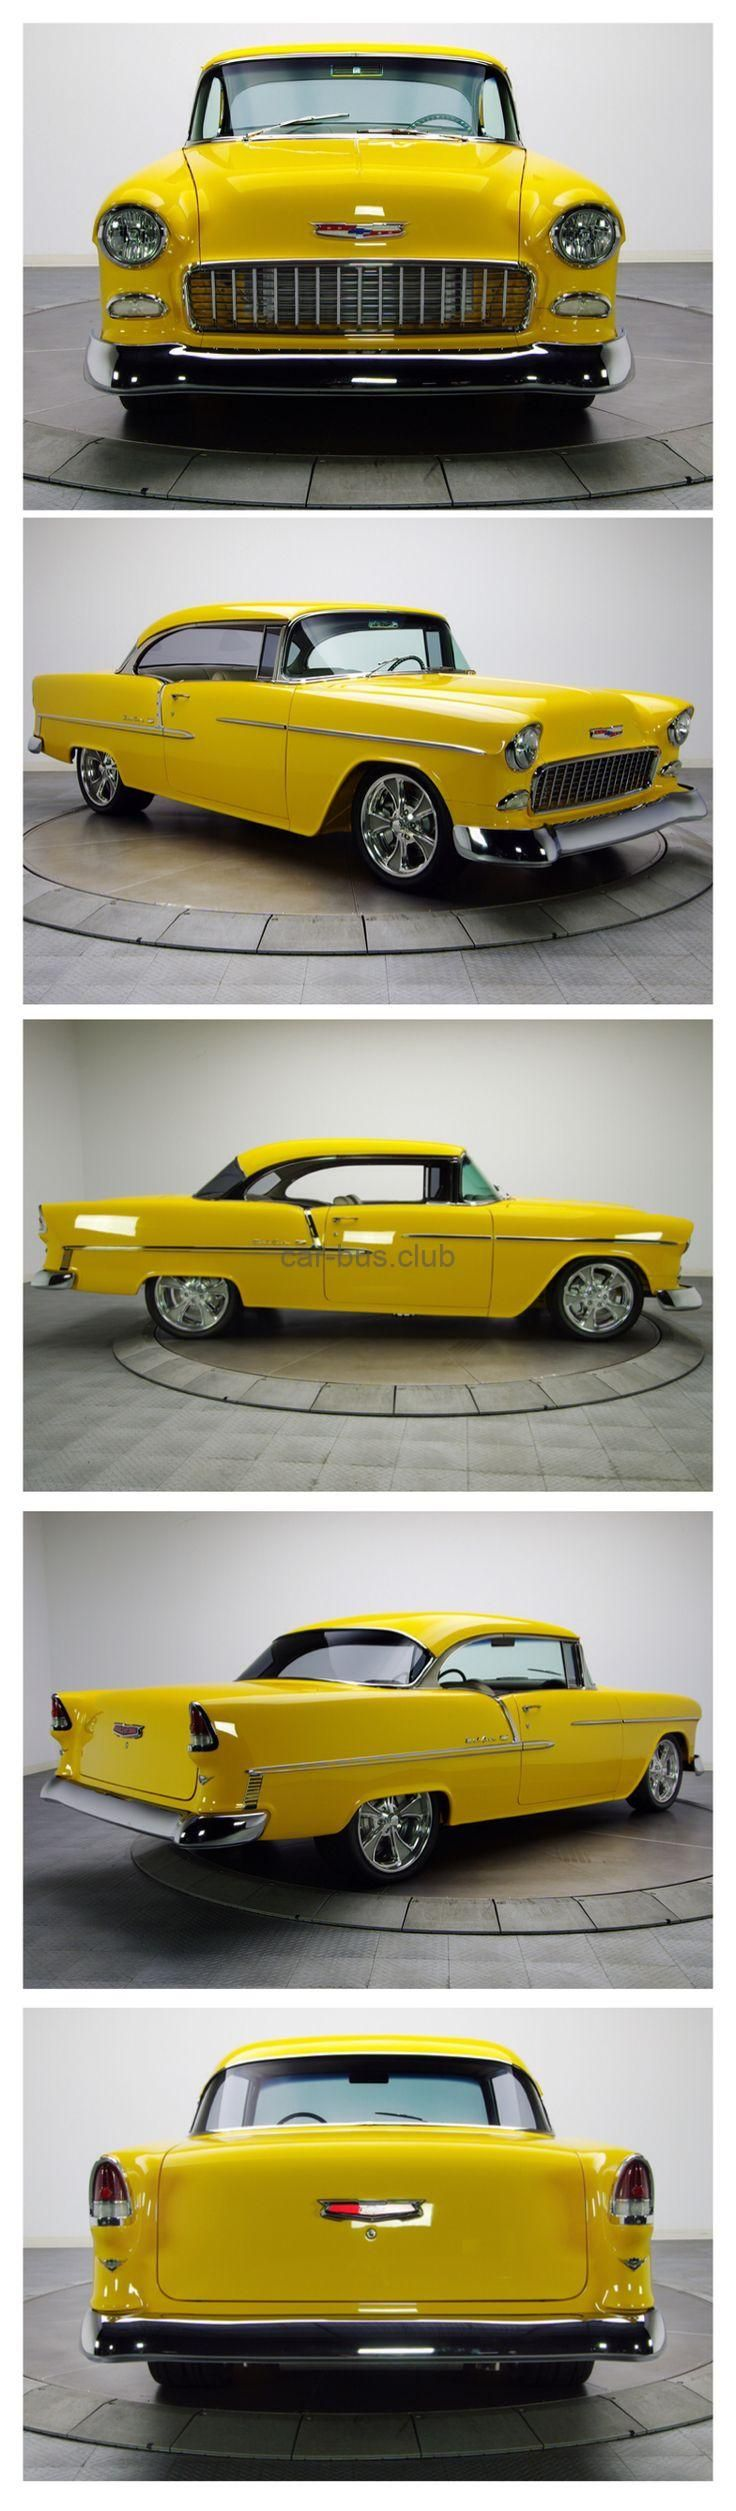 1955 Chevy Belair bus automobile automobiles we're